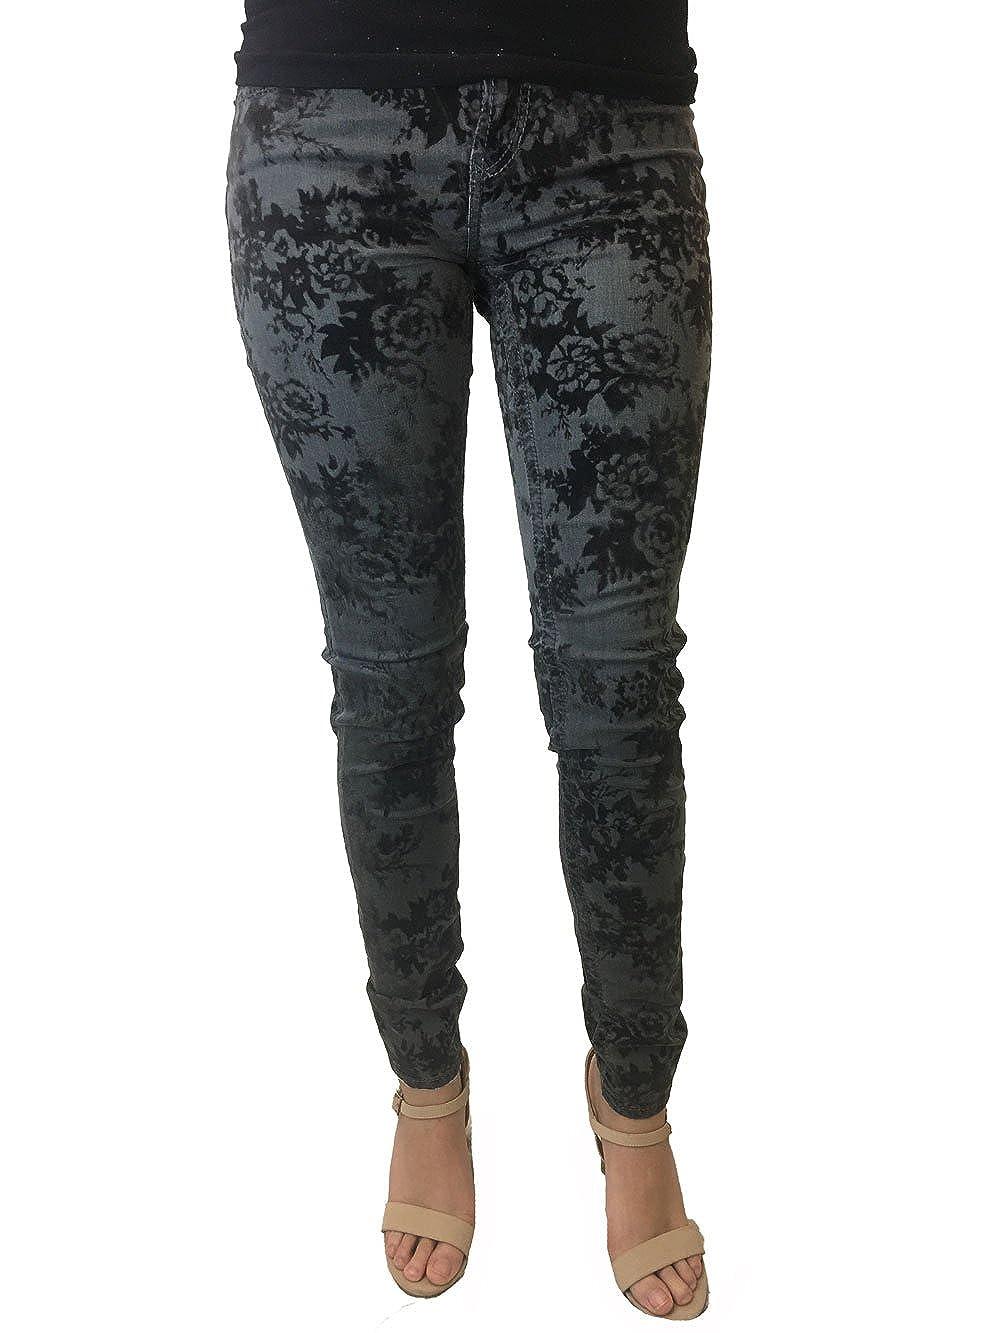 DEAR JOHN Womens Joyrich Taylor Smoke Faux Velvet Floral Printed Skinny Jeans